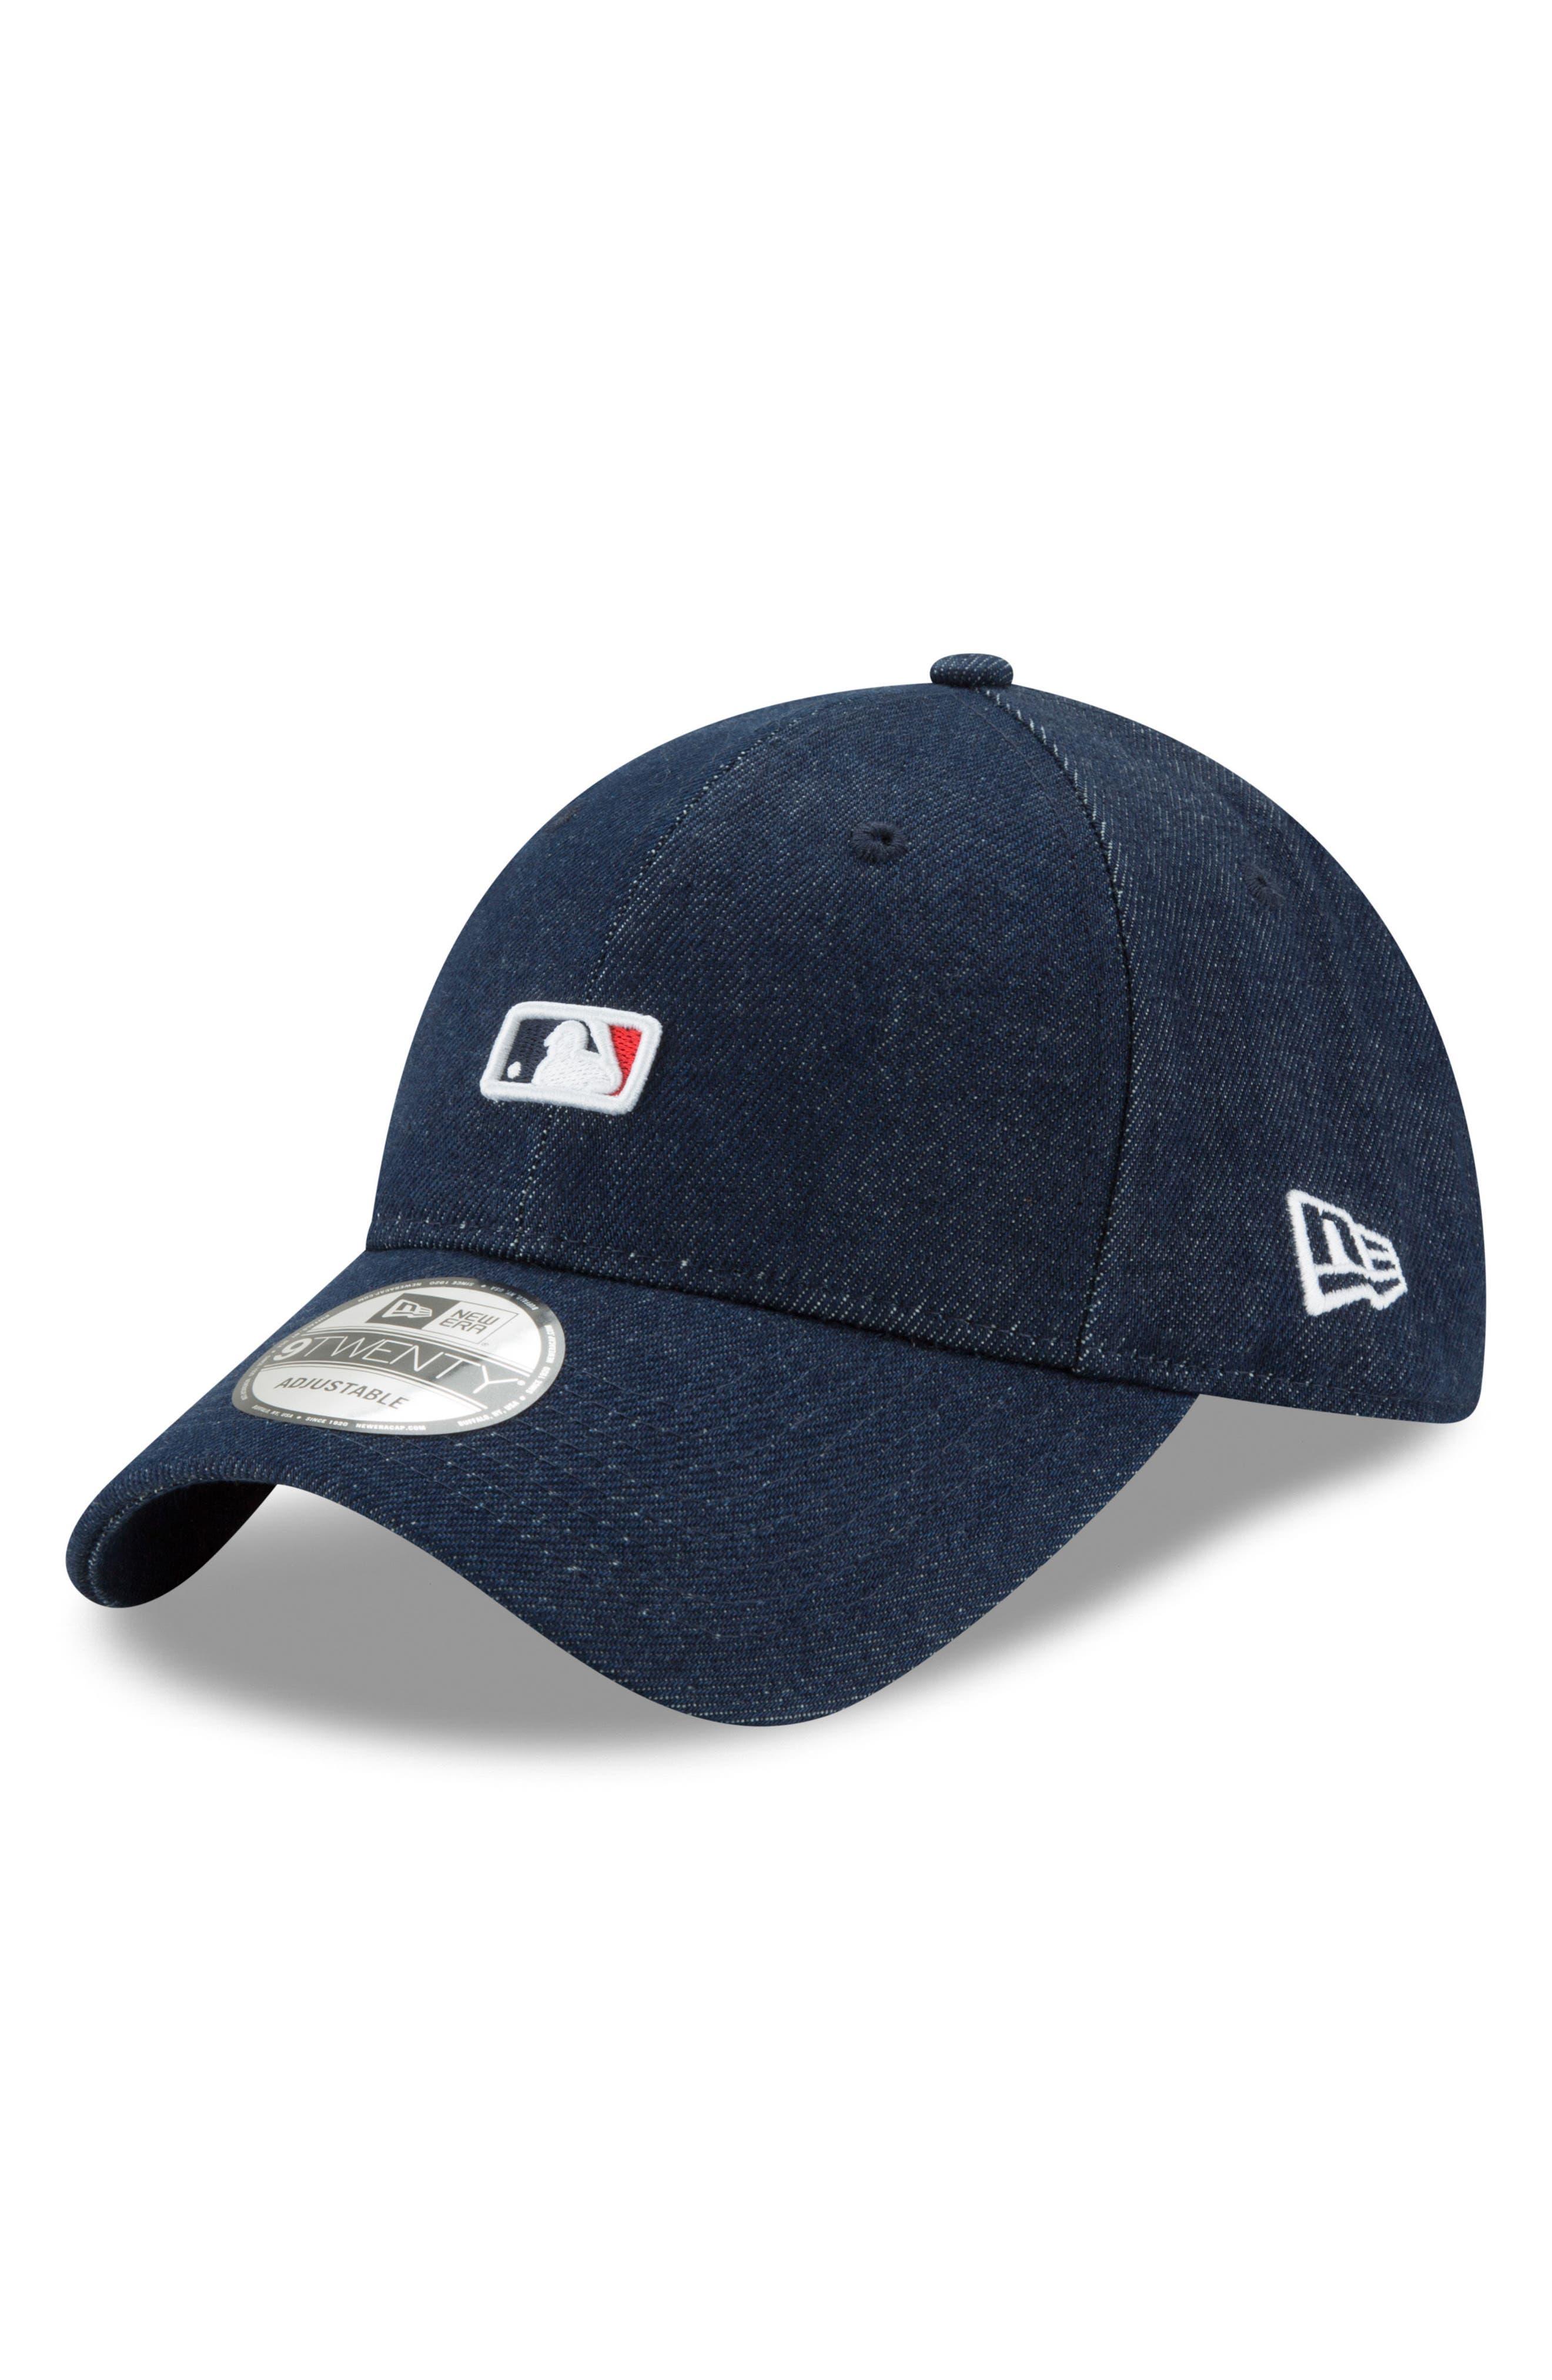 x Levi's<sup>®</sup> MLB Micro Batterman Baseball Cap,                         Main,                         color, Black